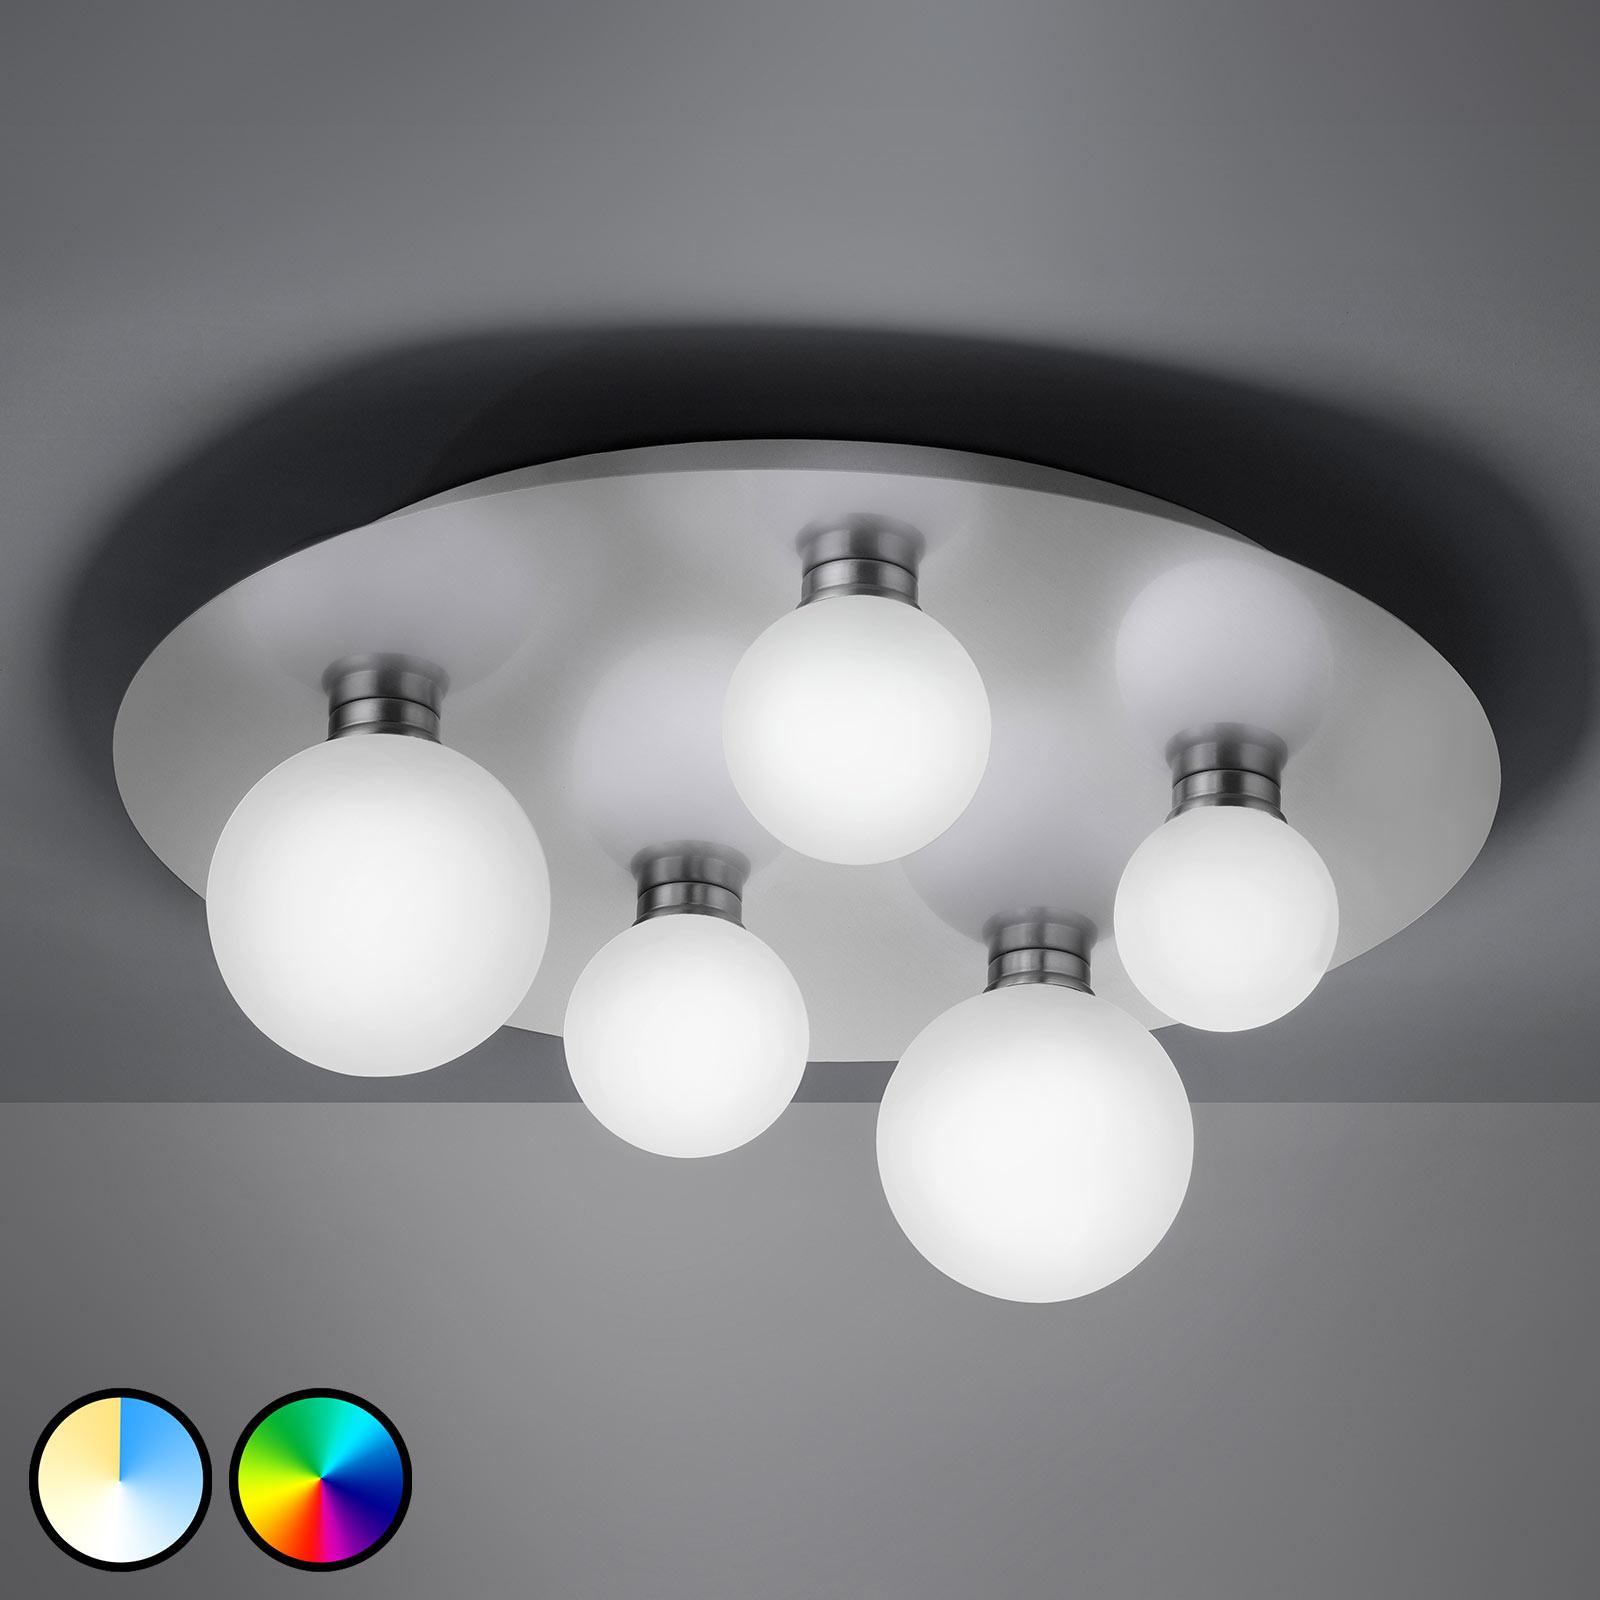 Trio WiZ Dicapo lampa sufitowa LED, 5-punktowa